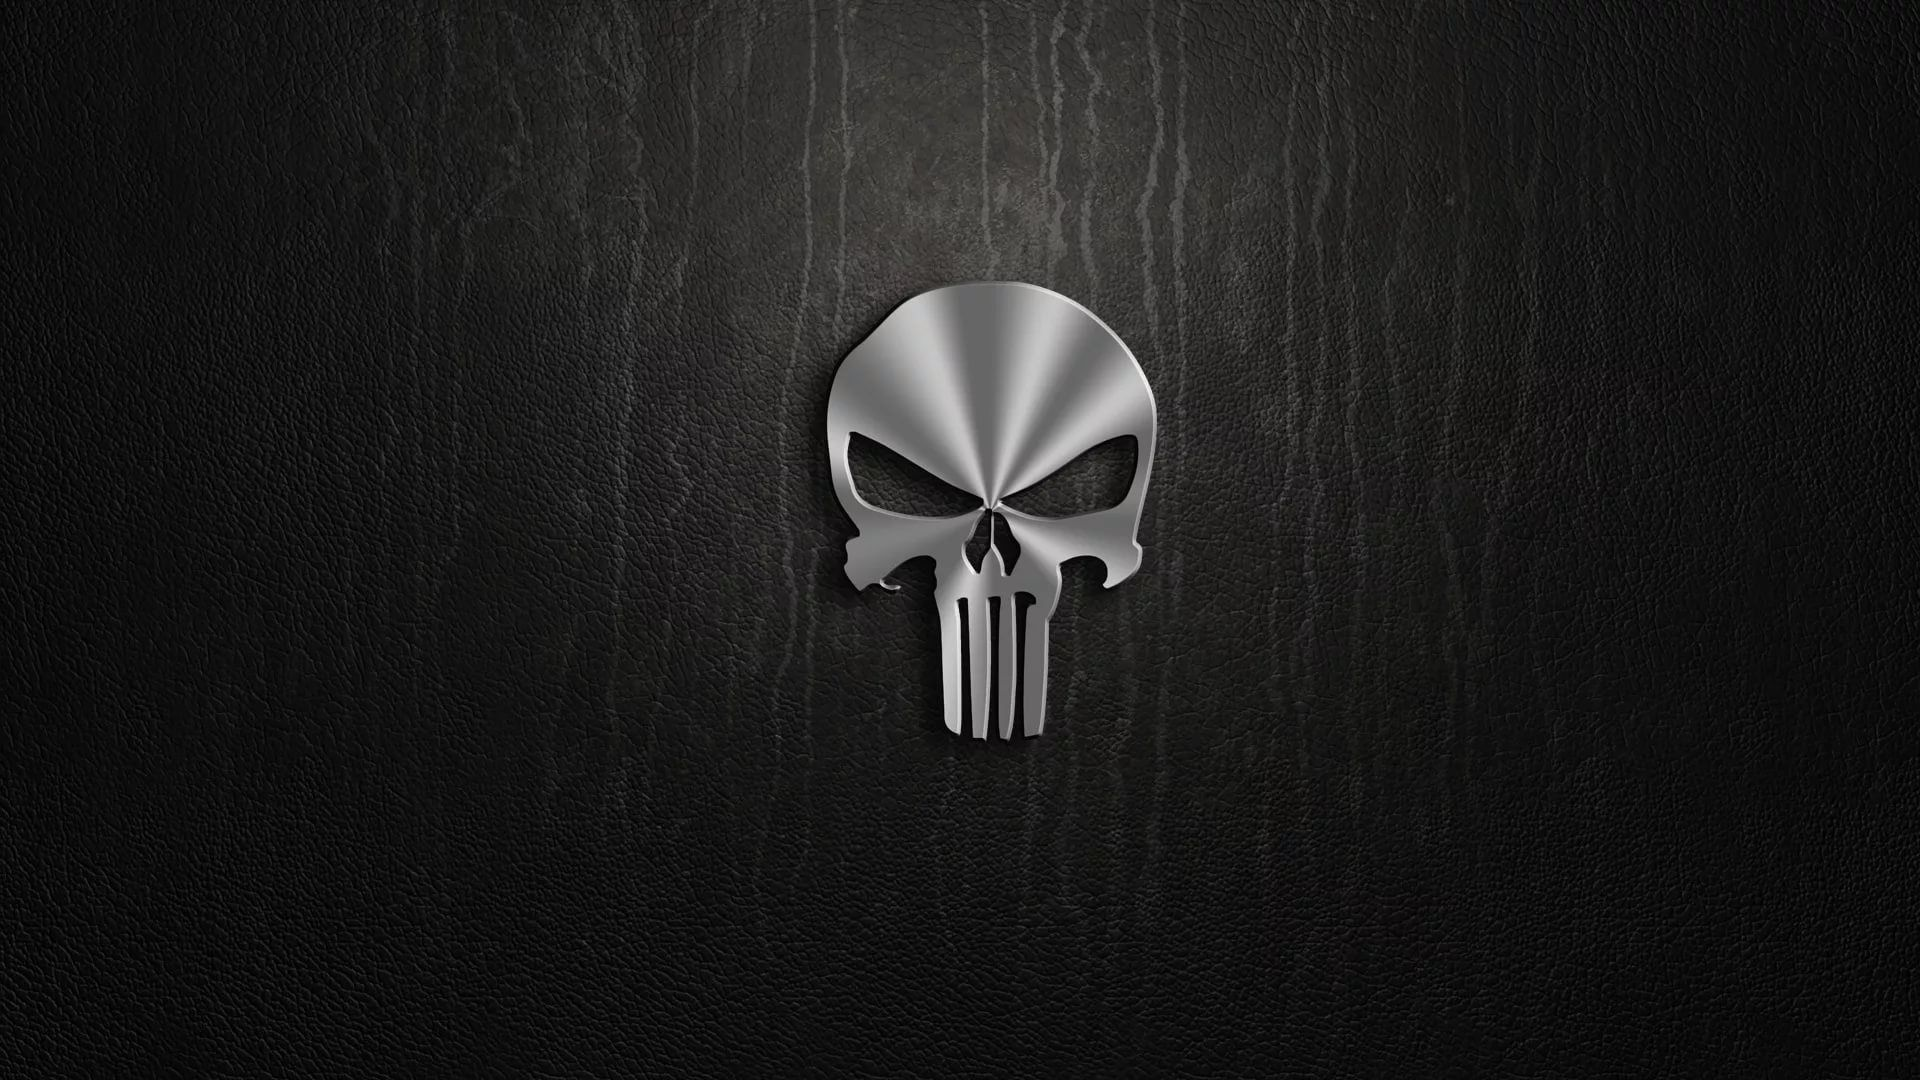 Punisher Skull wallpaper photo hd